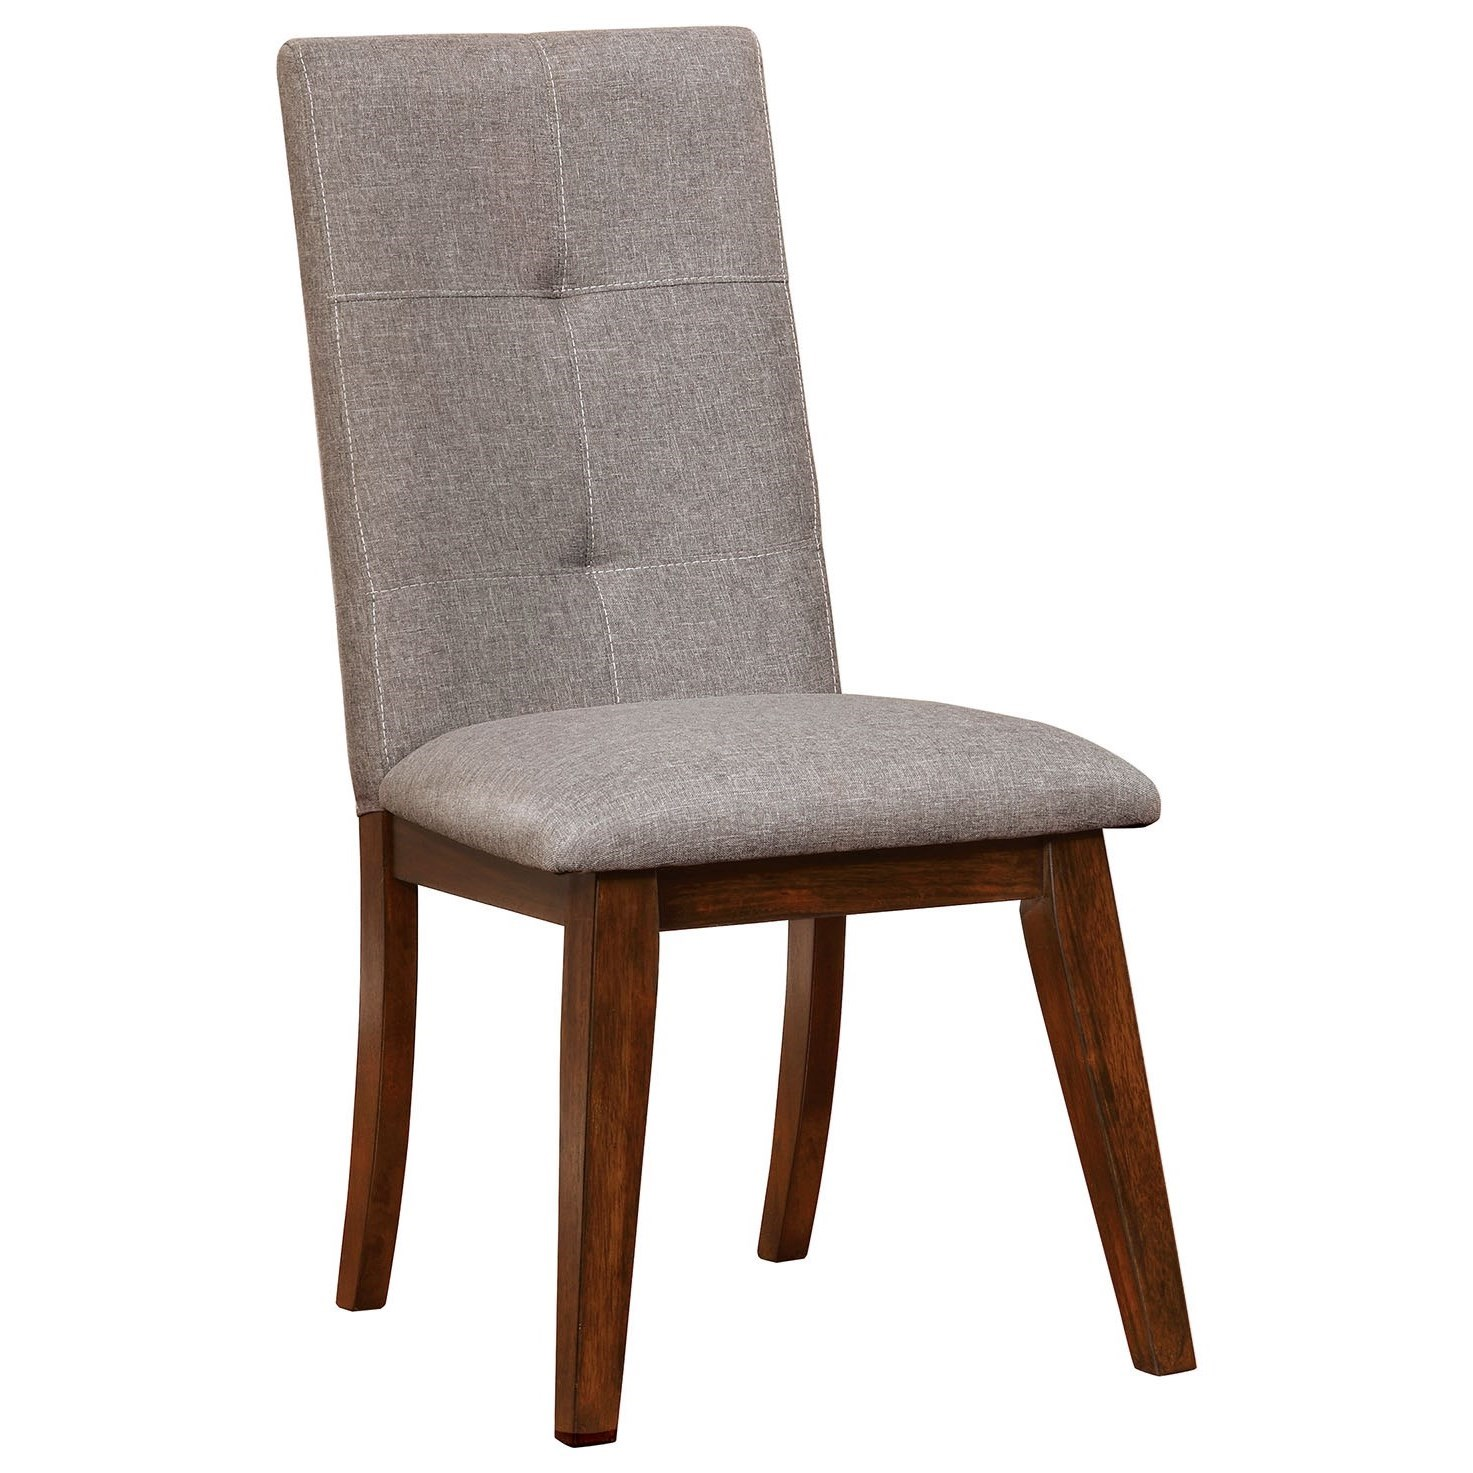 Furniture of America Abelone Side Chair (2/CTN) - Item Number: CM3354SC-2PK